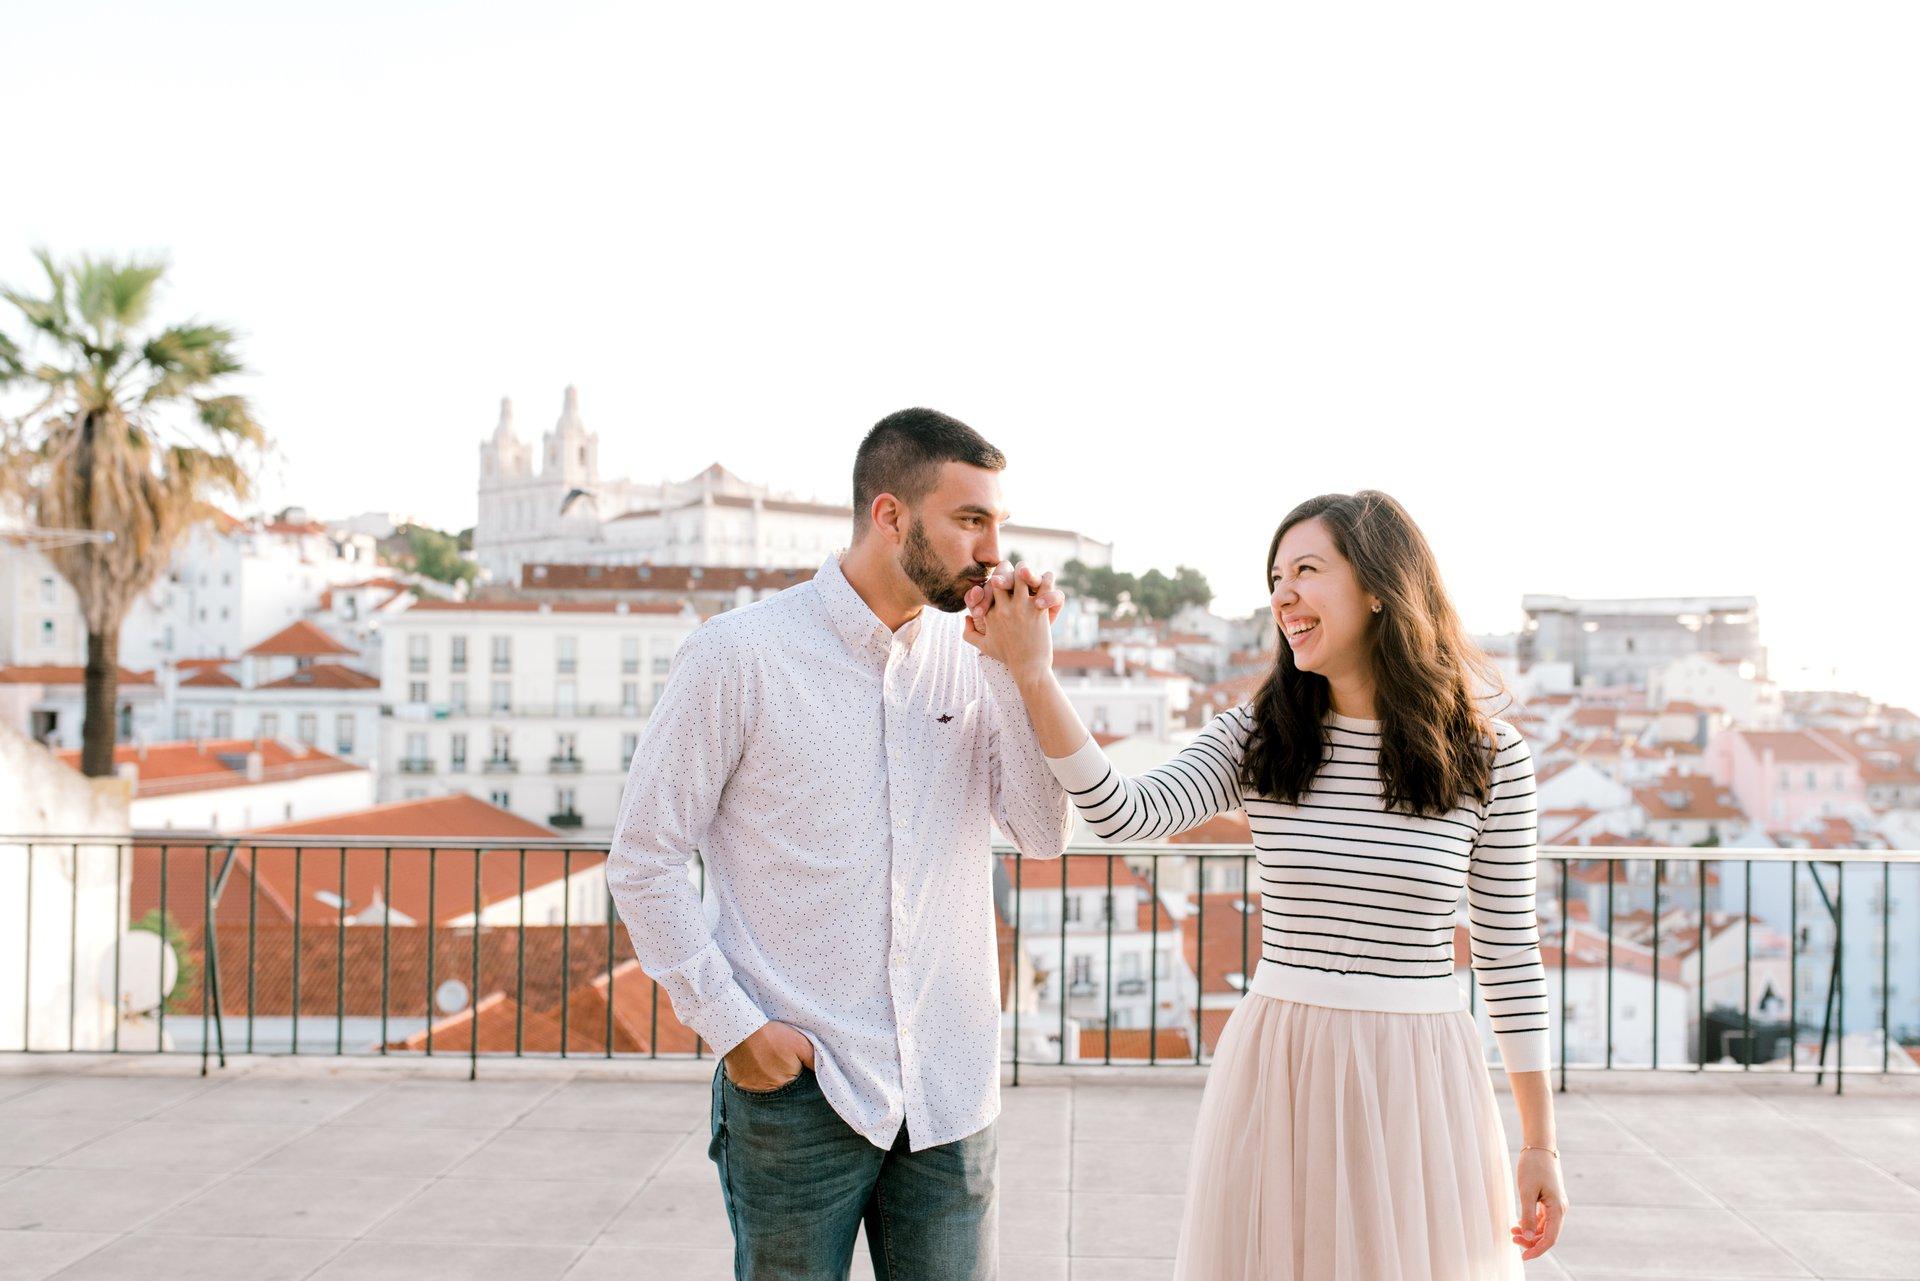 Lisbon-Portugal-travel-story-Flytographer-3